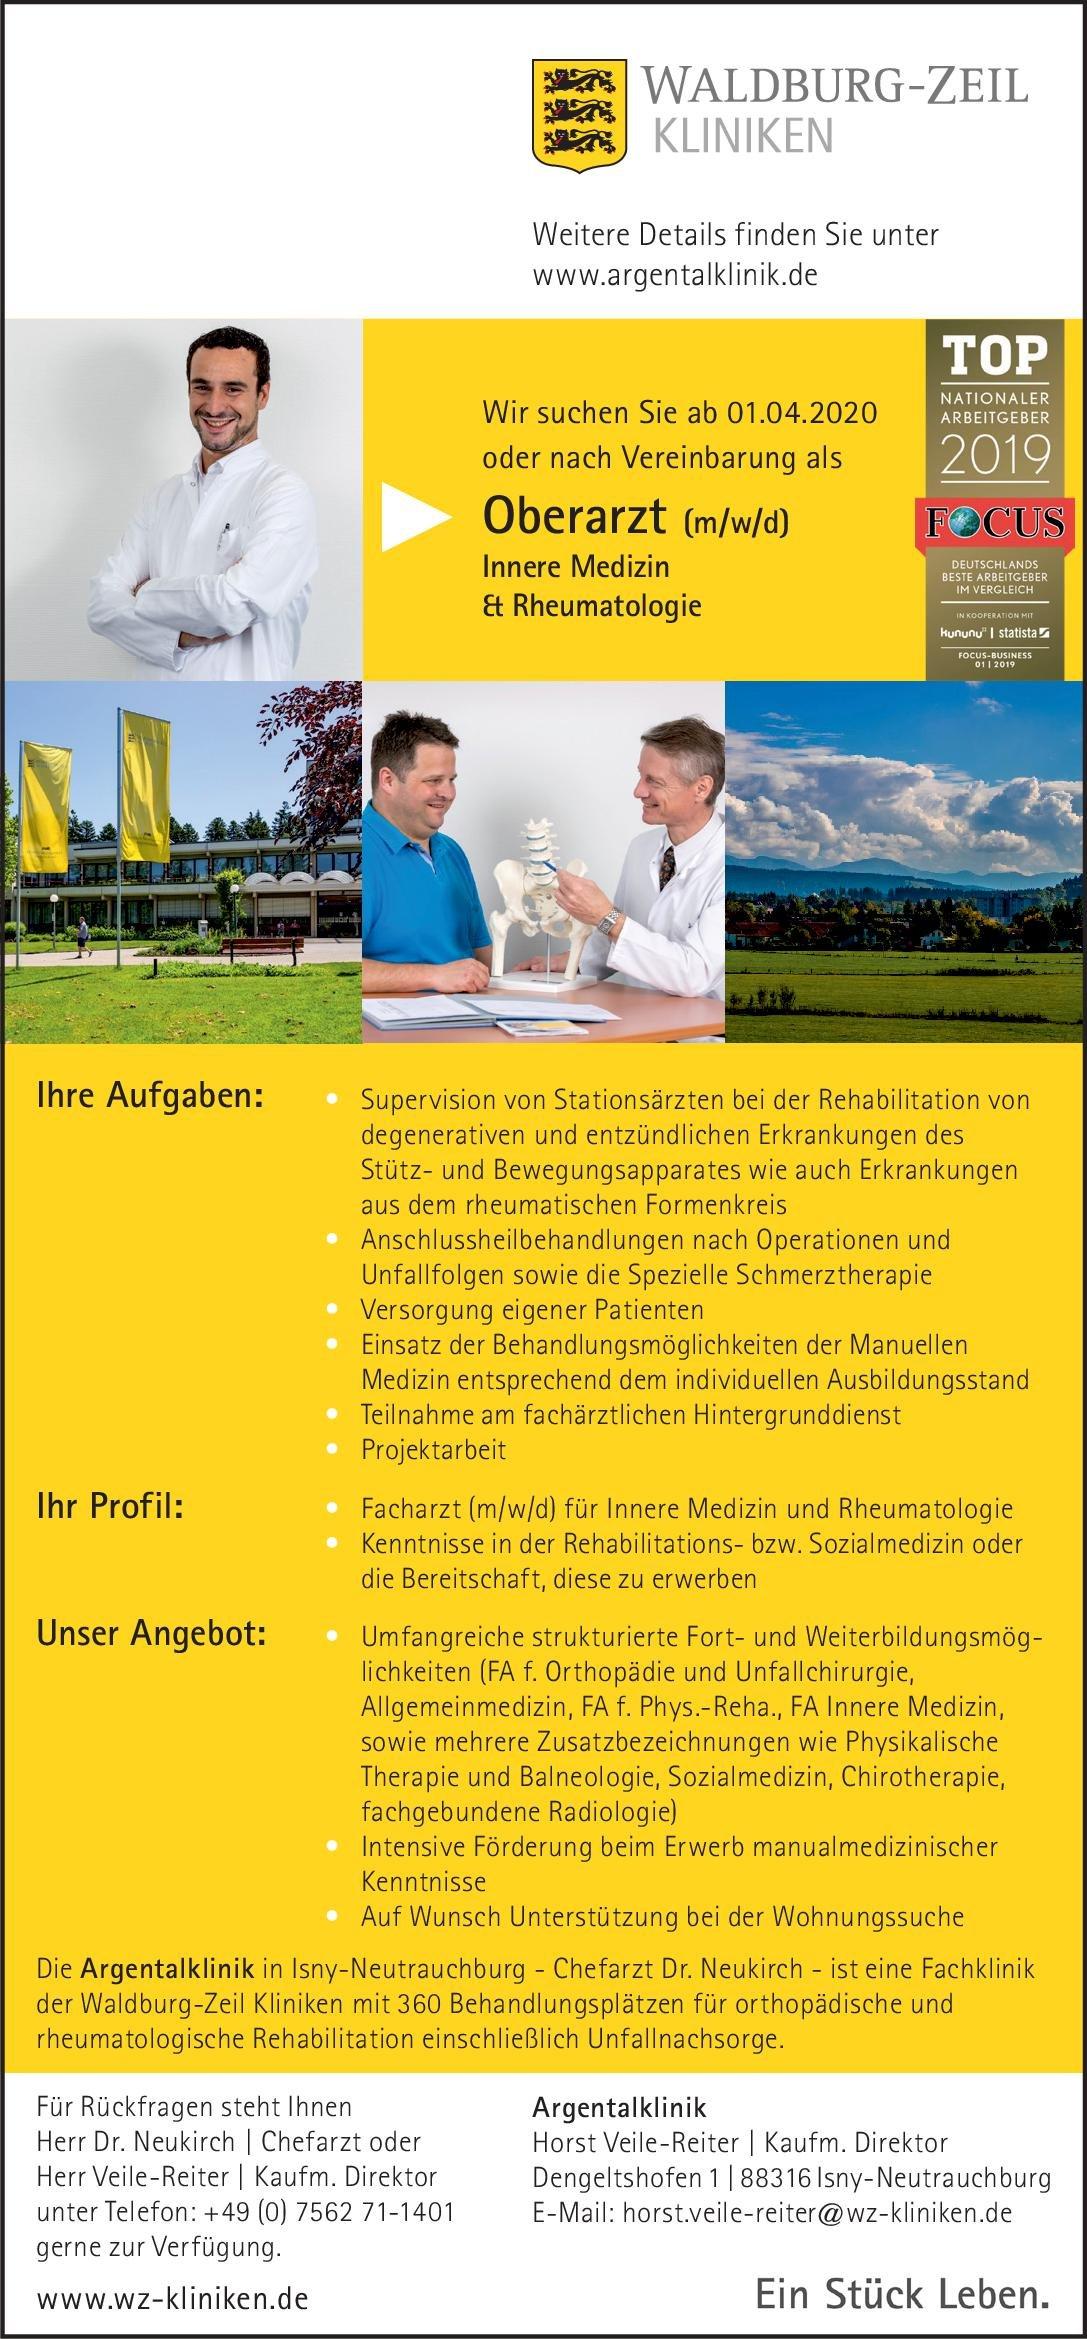 Waldburg-Zeil Kliniken - Argentalklinik Oberarzt (m/w/d) Innere Medizin & Rheumatologie  Innere Medizin und Rheumatologie, Innere Medizin Oberarzt